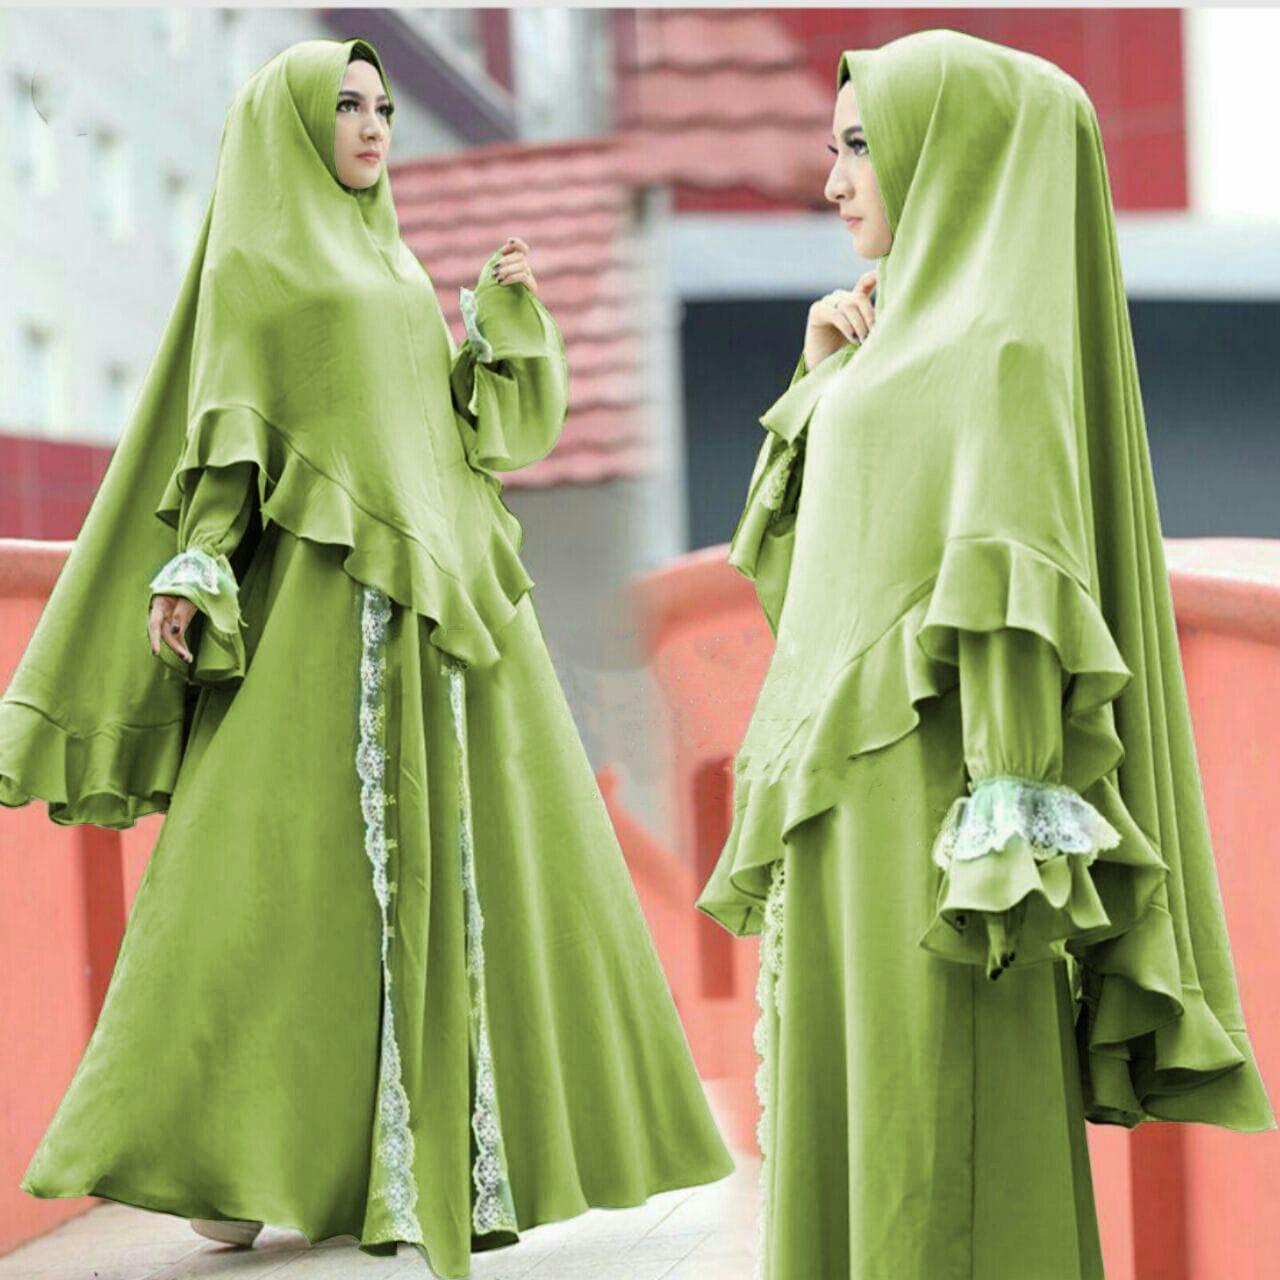 TERLARIS!!! [Syari Slavina Alpukat SW] gamis wanita jersey wanita hijau / baju muslim wanita / baju muslimah / baju muslim wamita terbaru / baju muslim murah